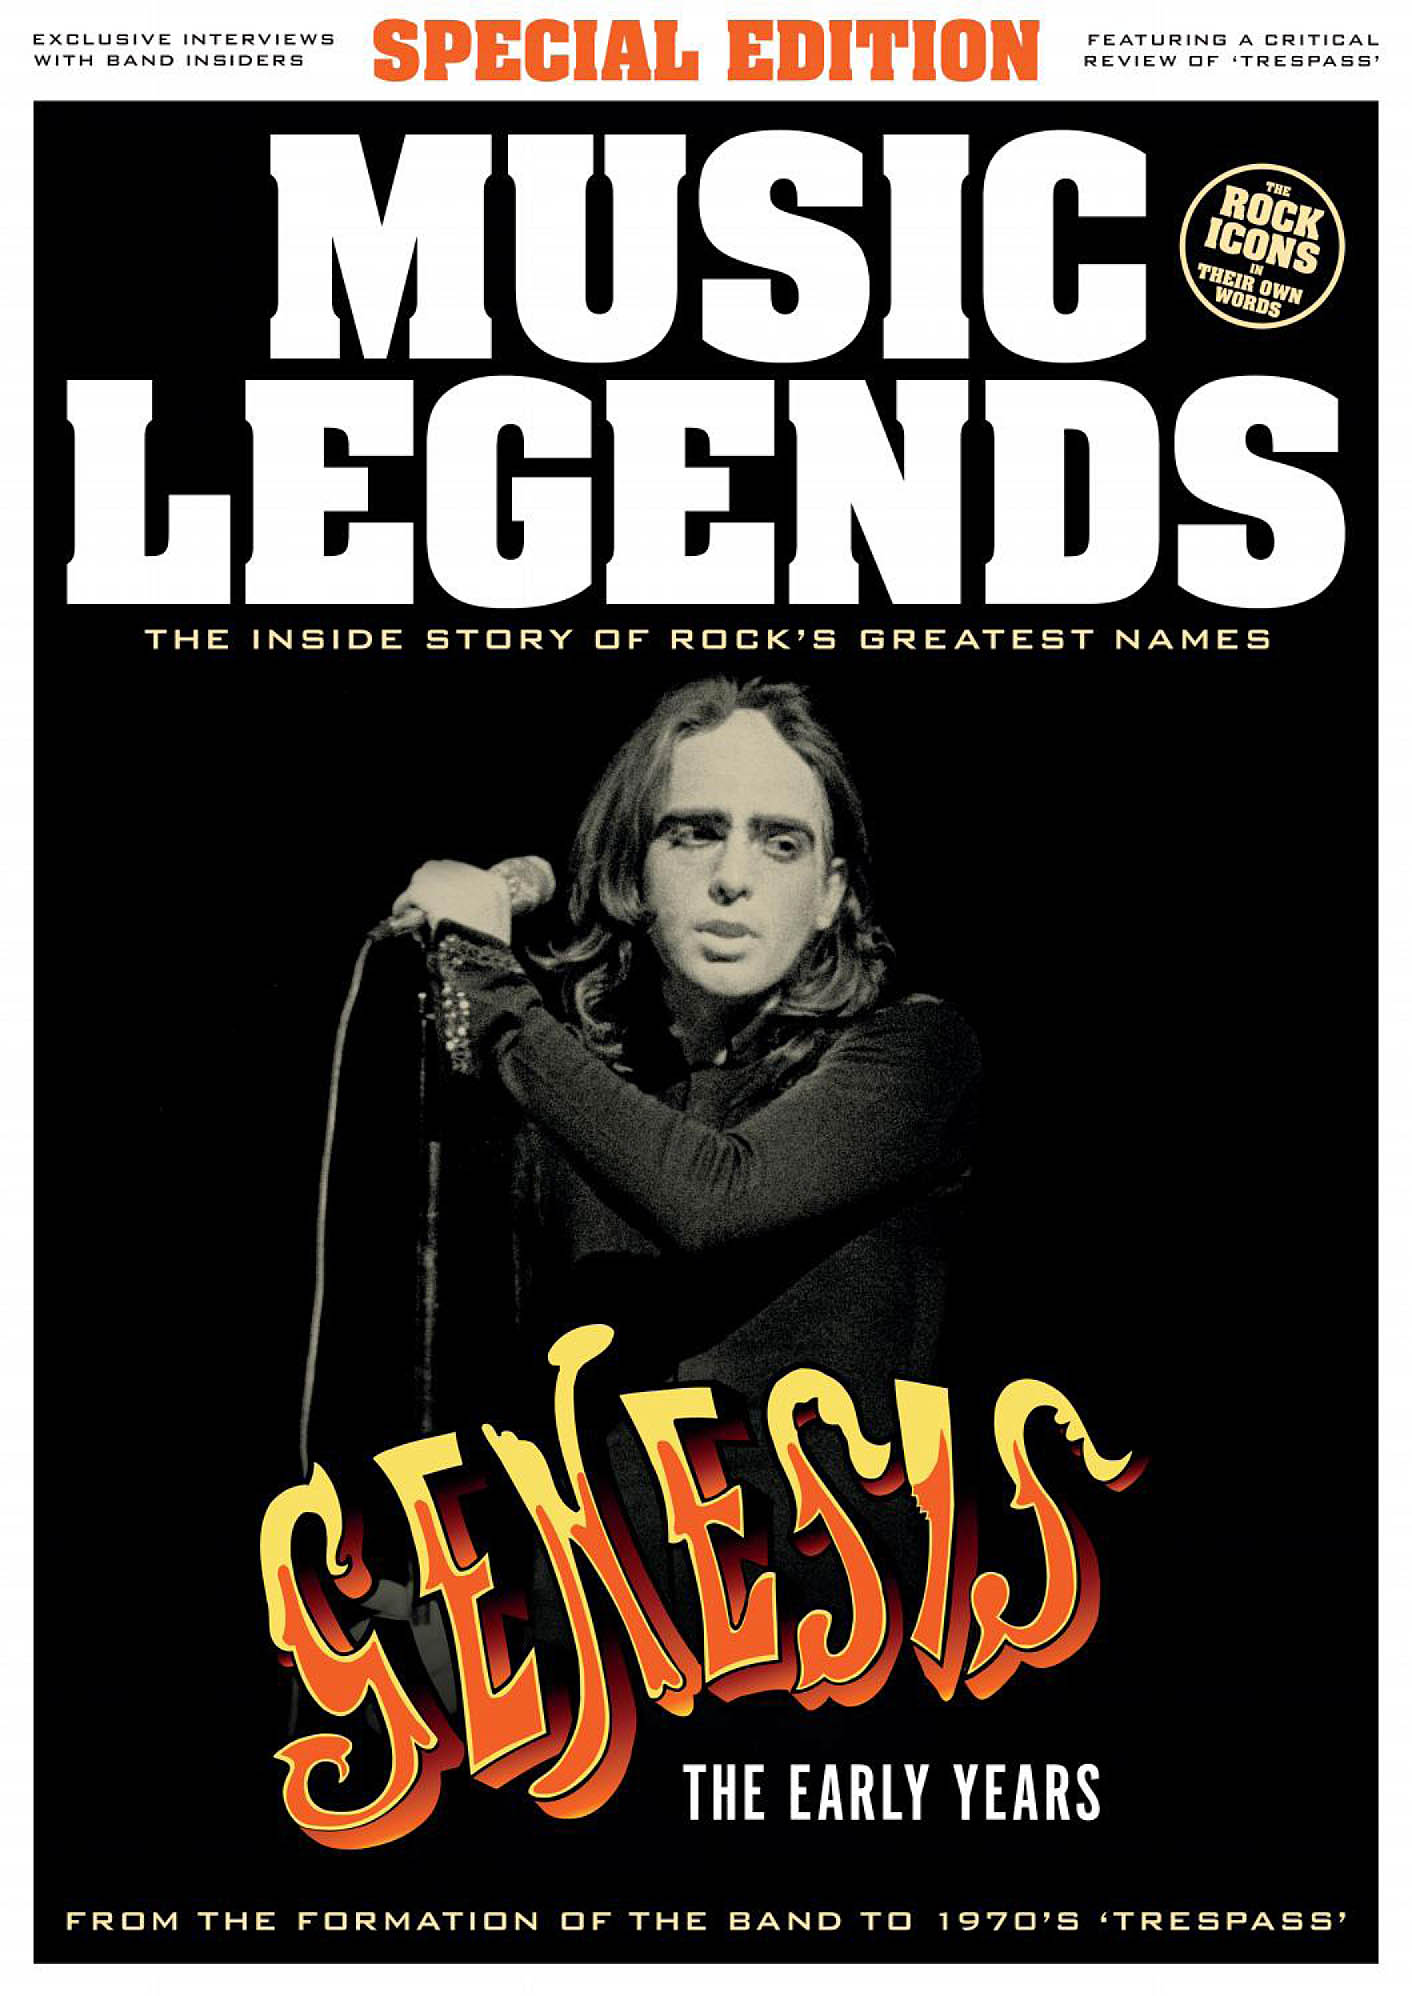 Music Legends Genesis Sp 2021 The Early Years.jpg